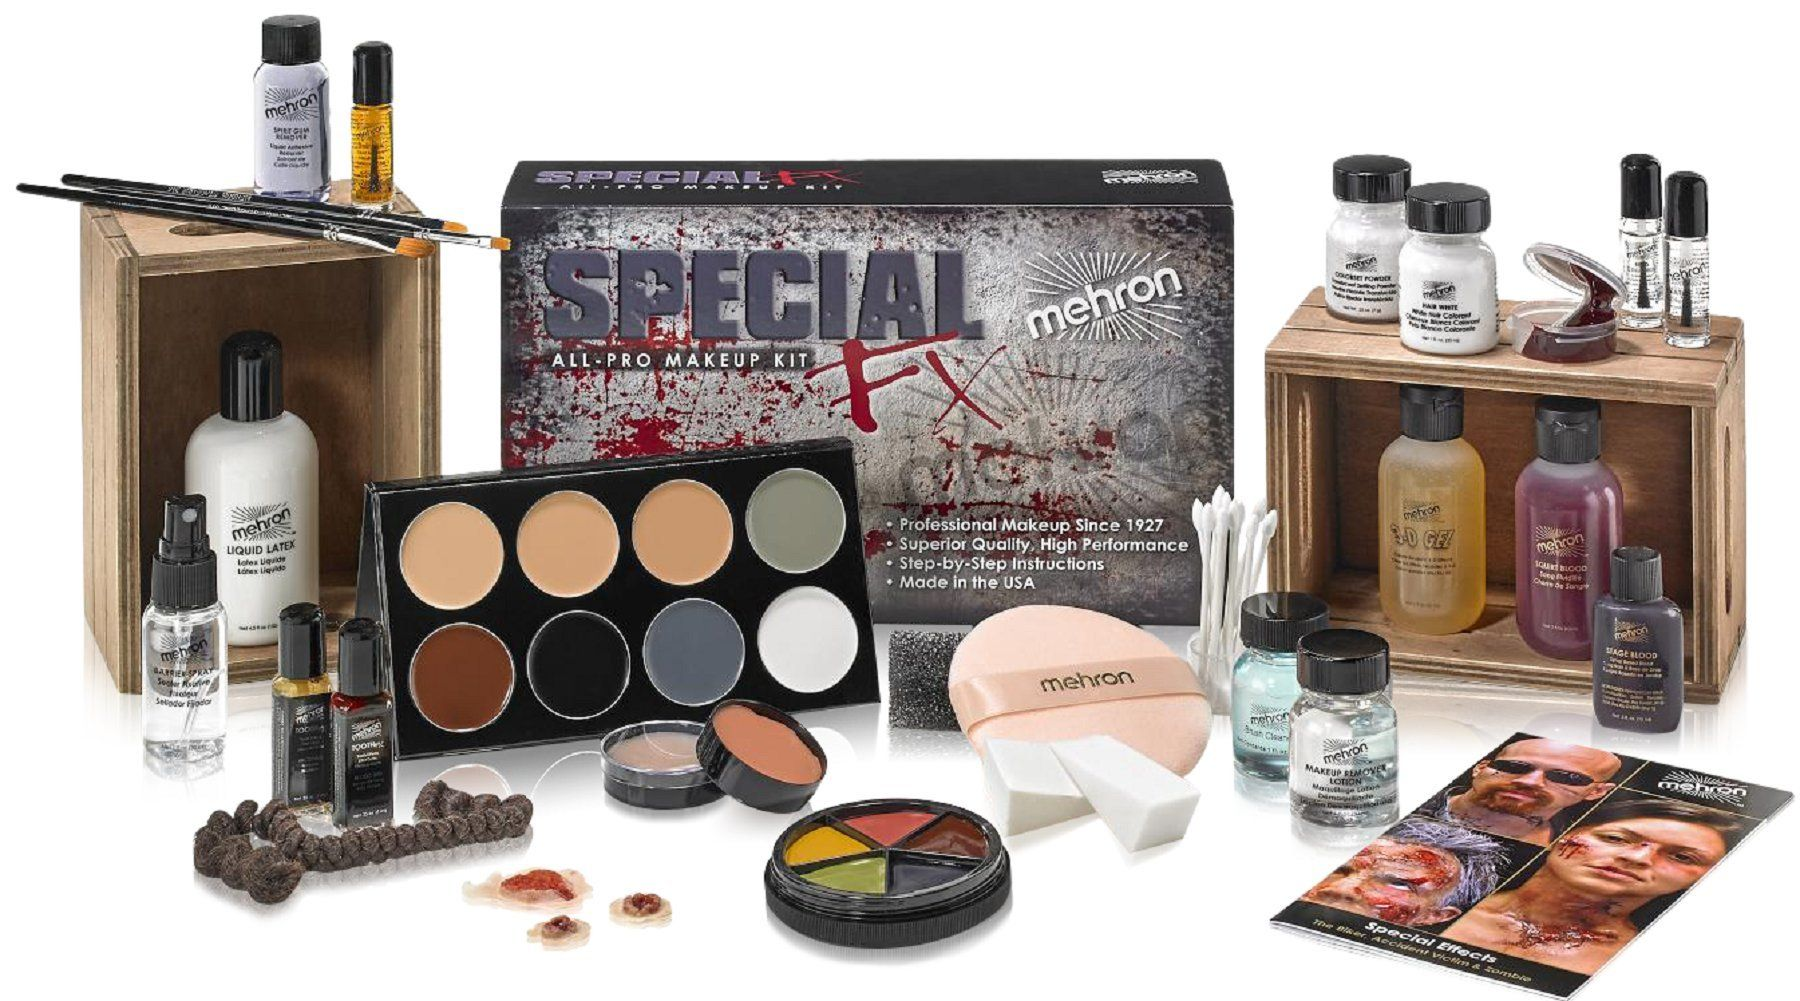 Mehron Makeup Special FX Kit (With images) Makeup kit